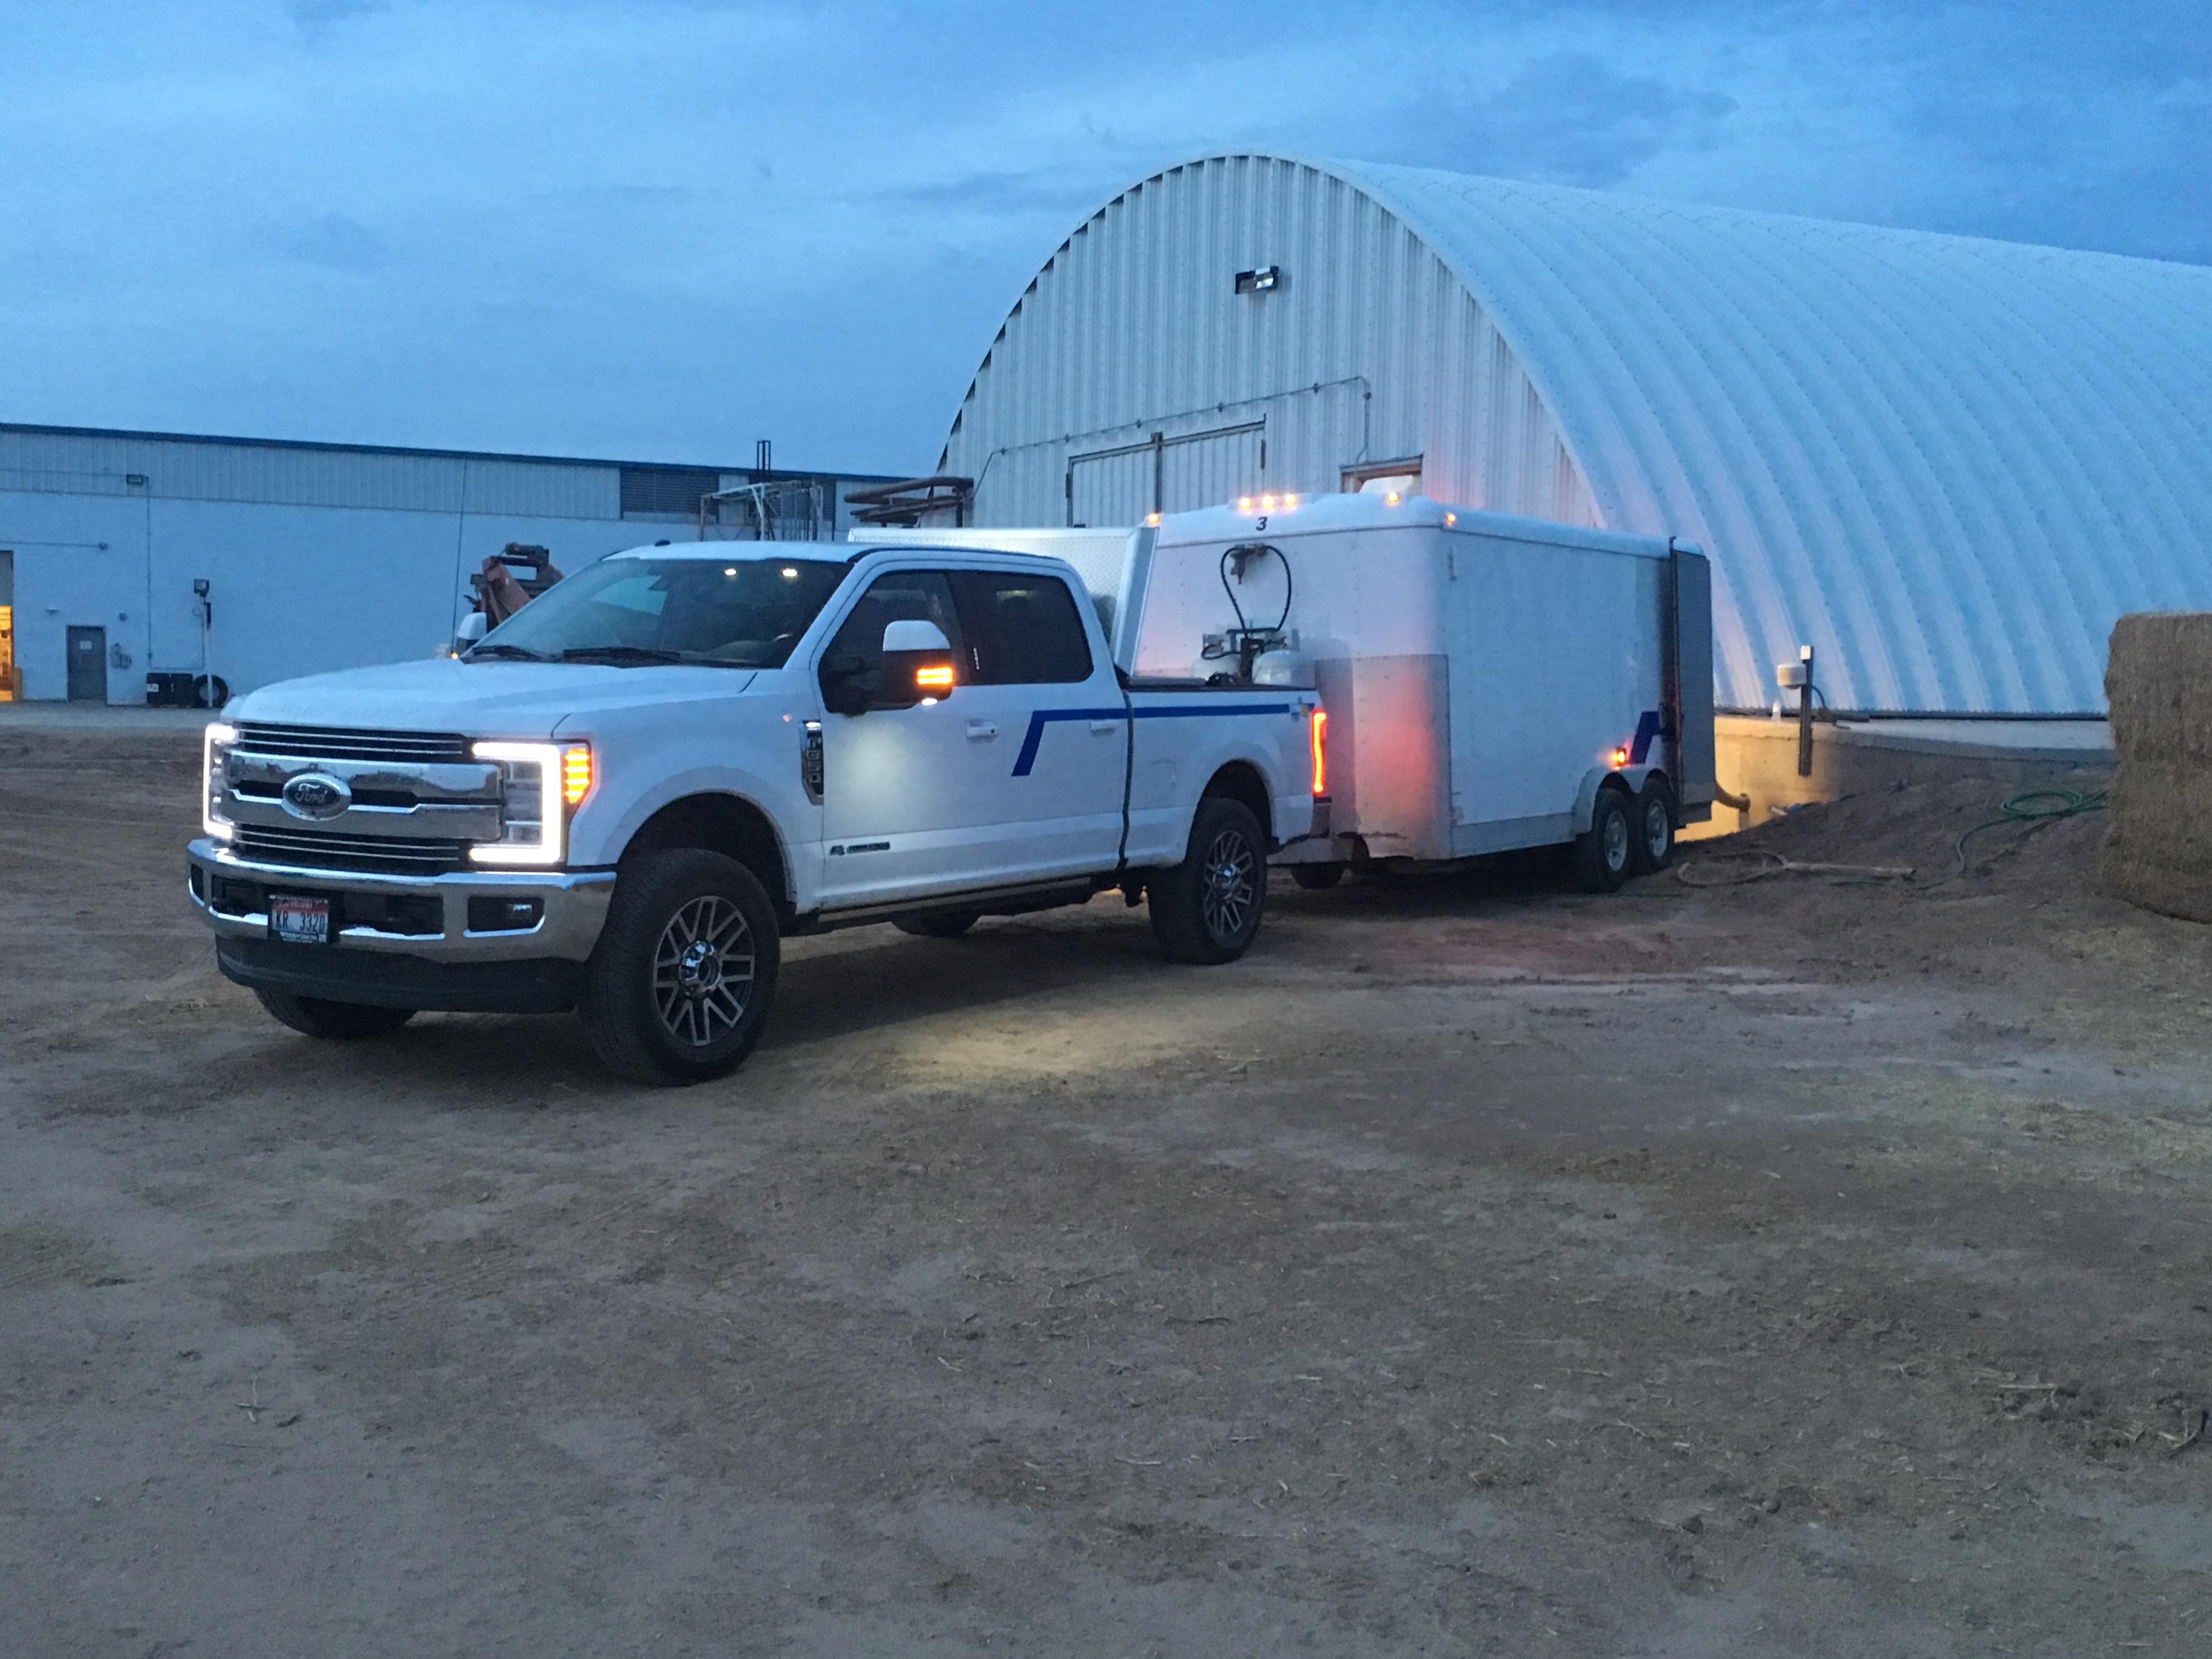 New pickup & trailer